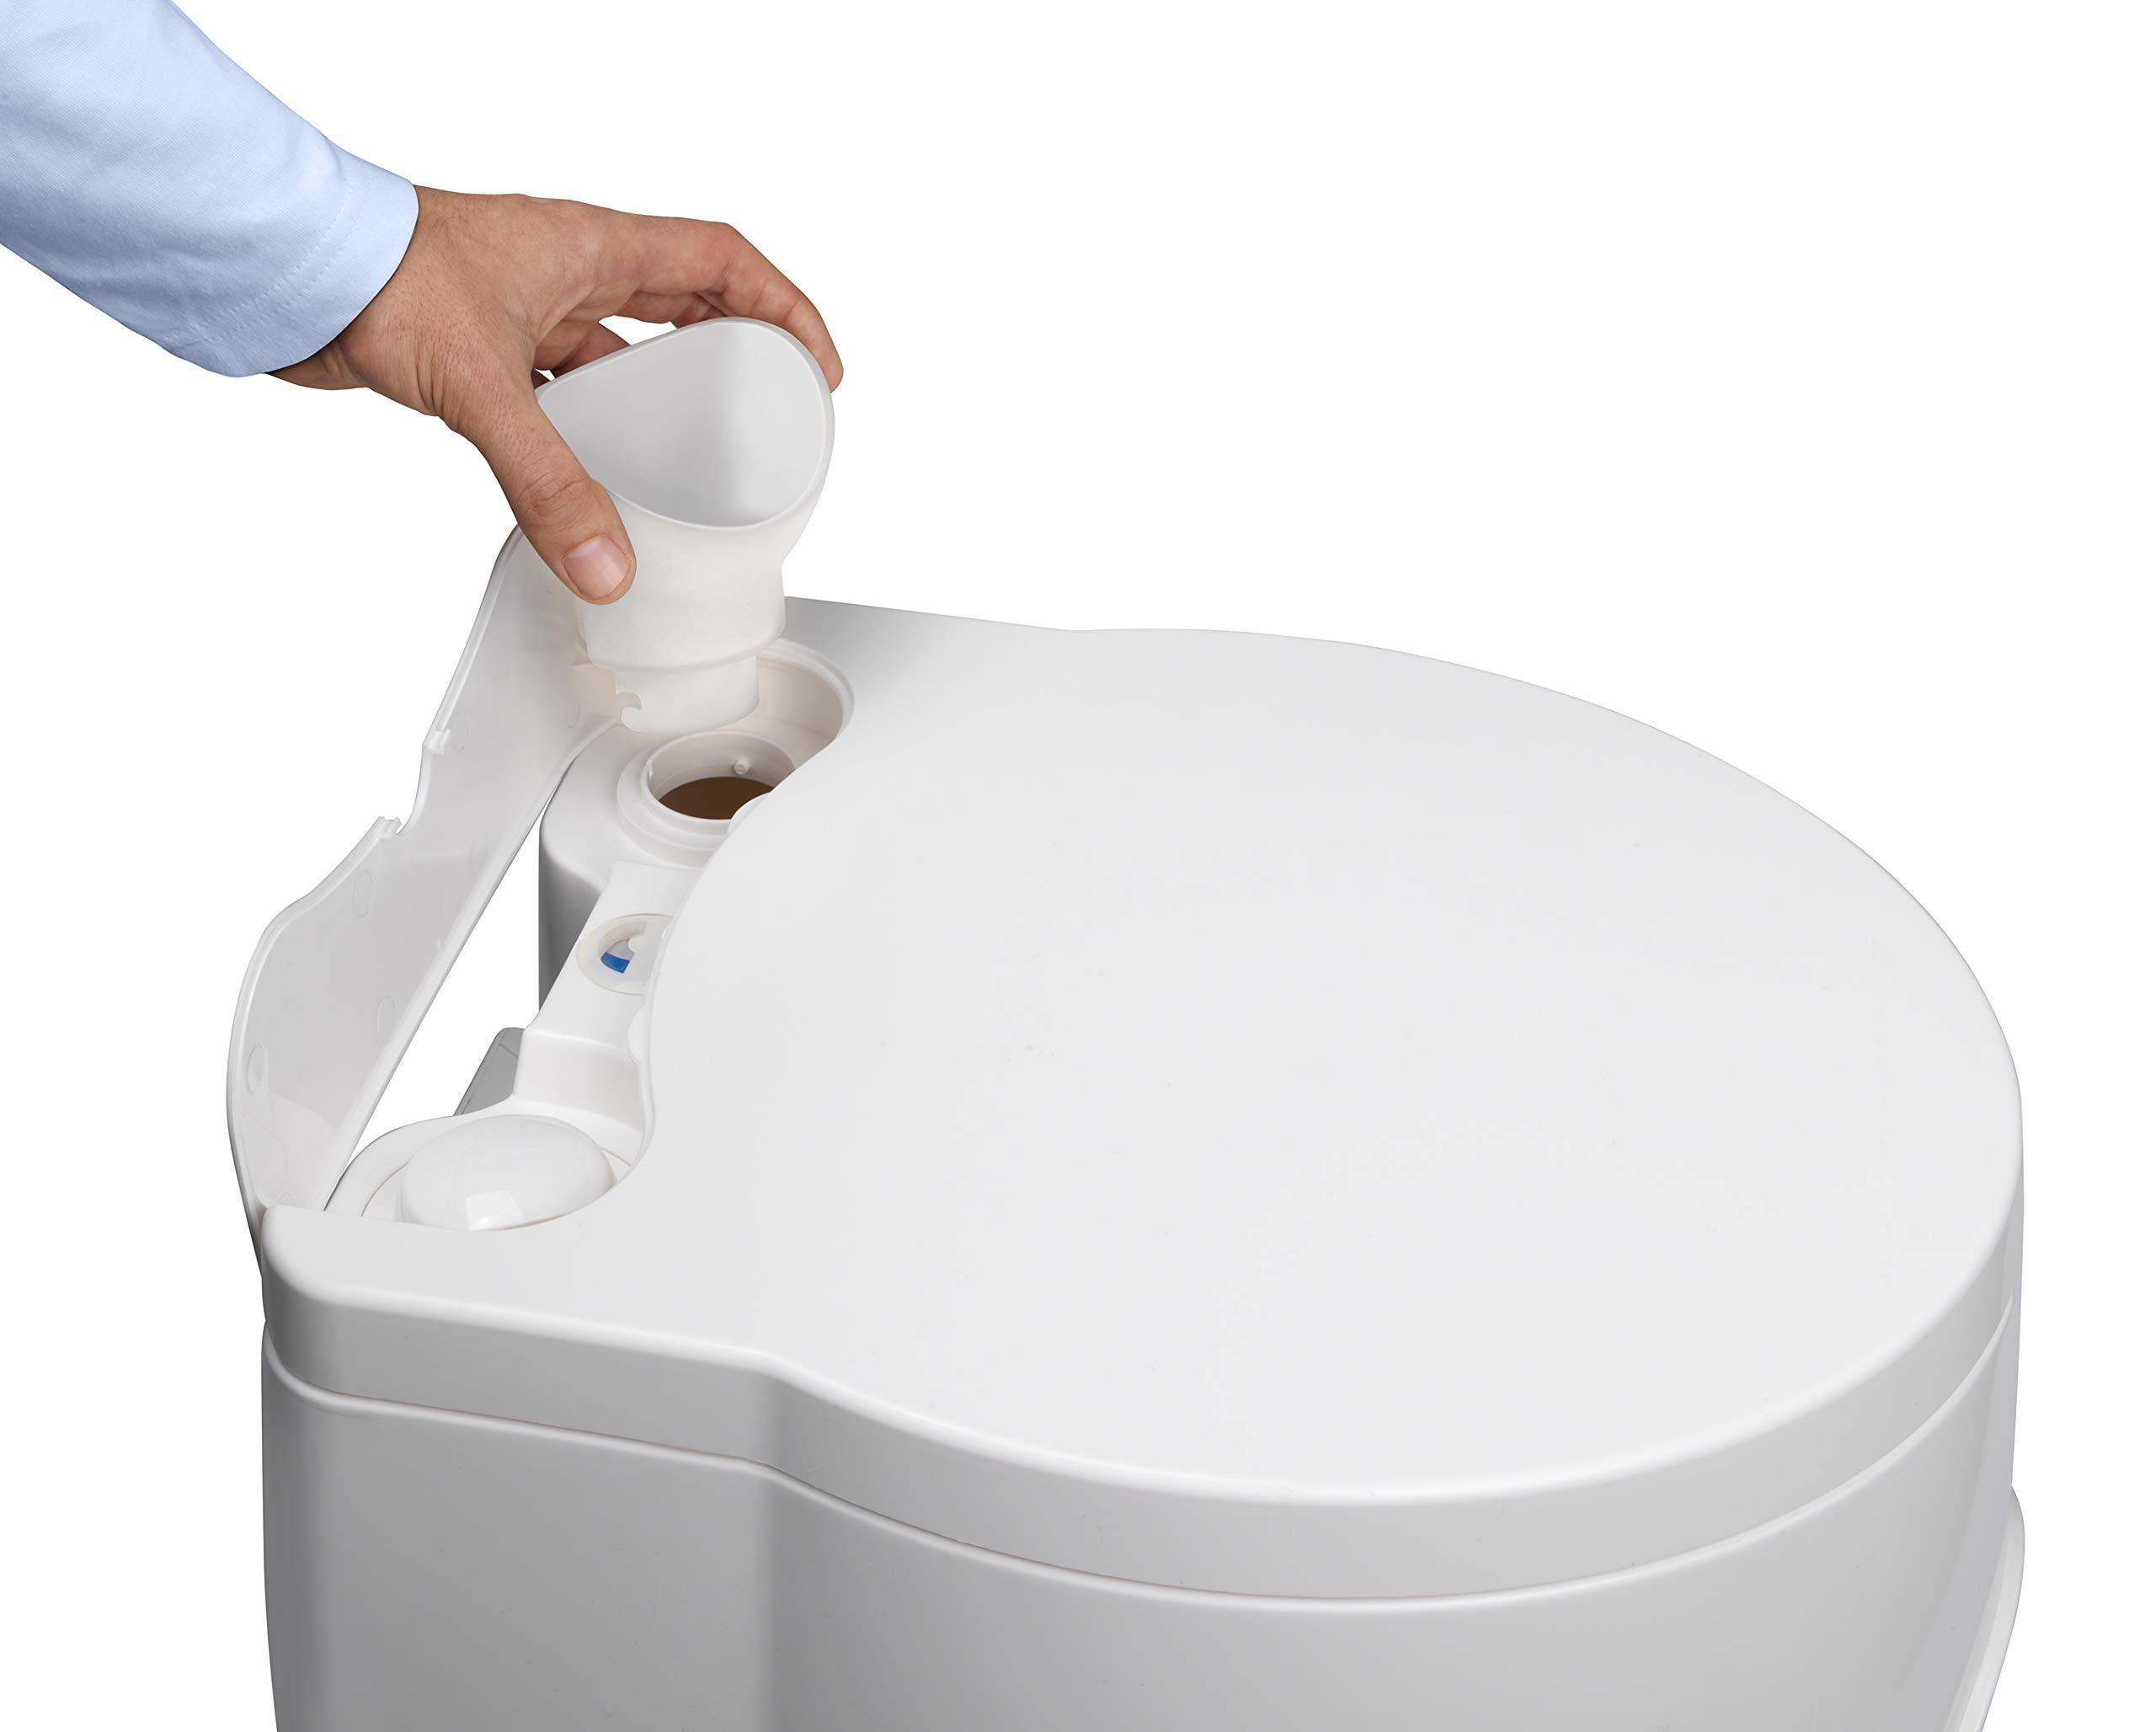 Thetford 92305 Porta Potti 565P Excellence Portable Toilet (Manual), 448 x 388 x 450 mm 17